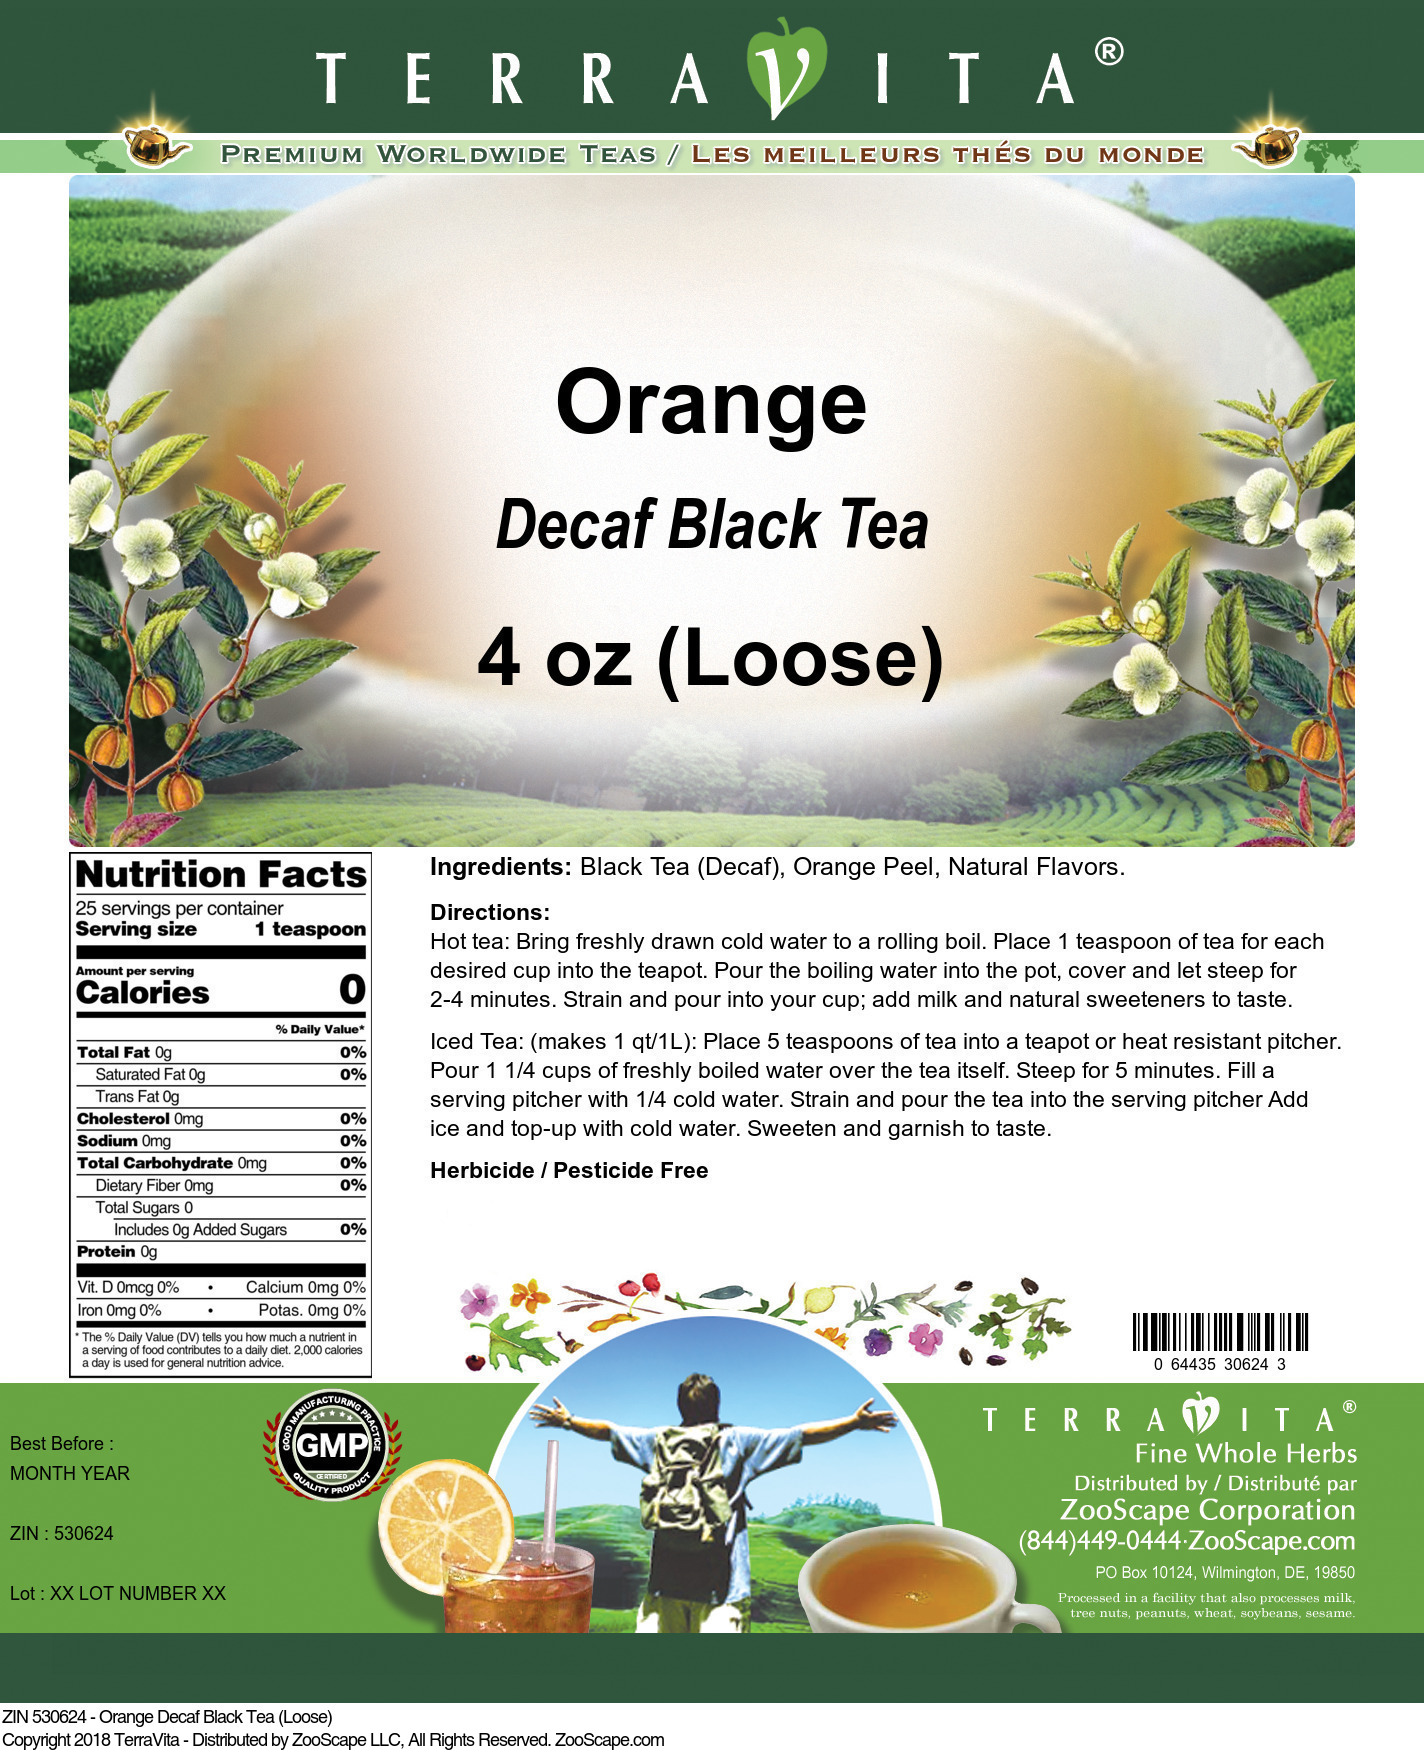 Orange Decaf Black Tea (Loose)